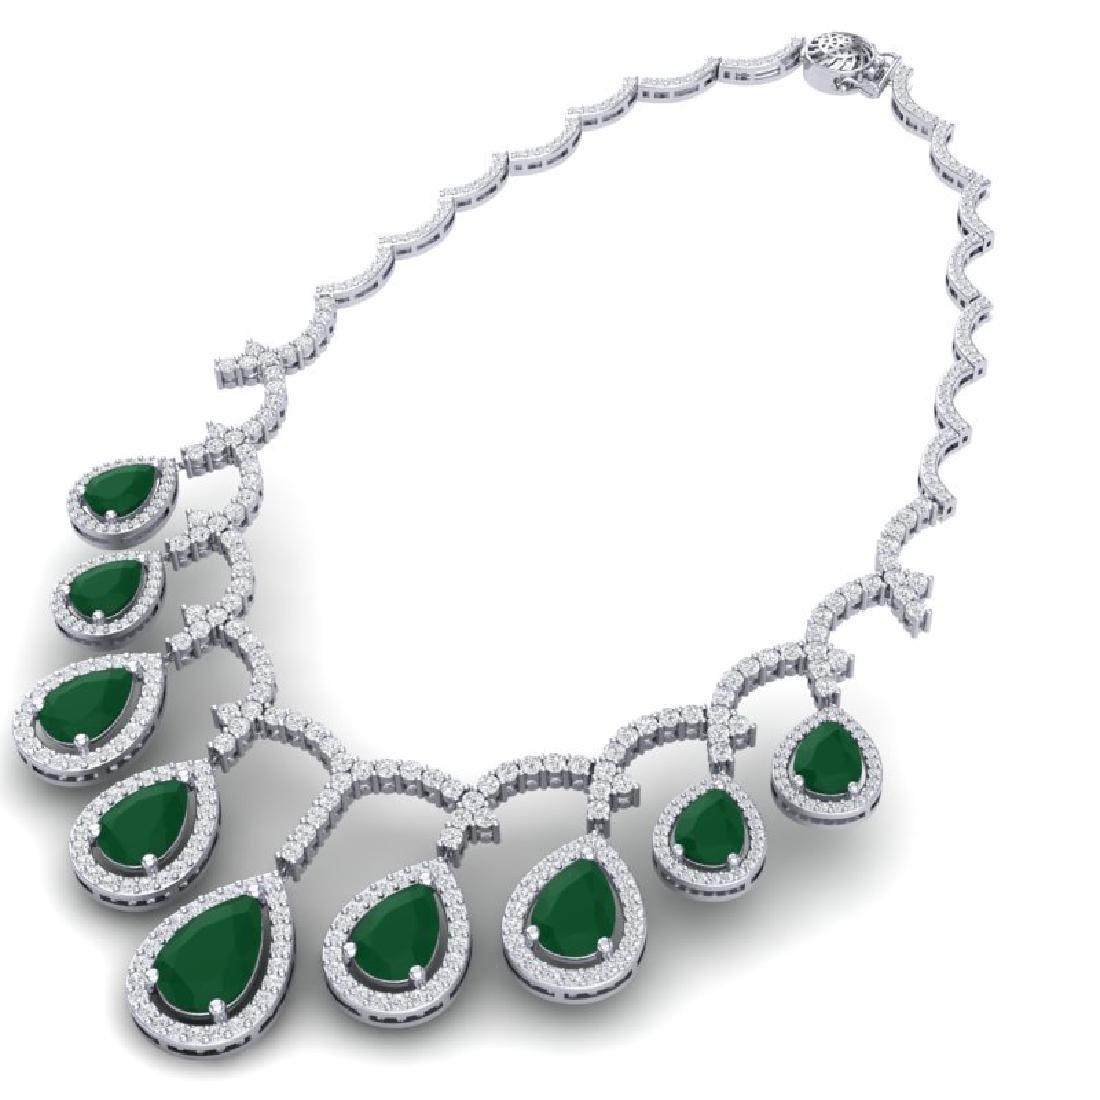 31.5 CTW Royalty Emerald & VS Diamond Necklace 18K - 3